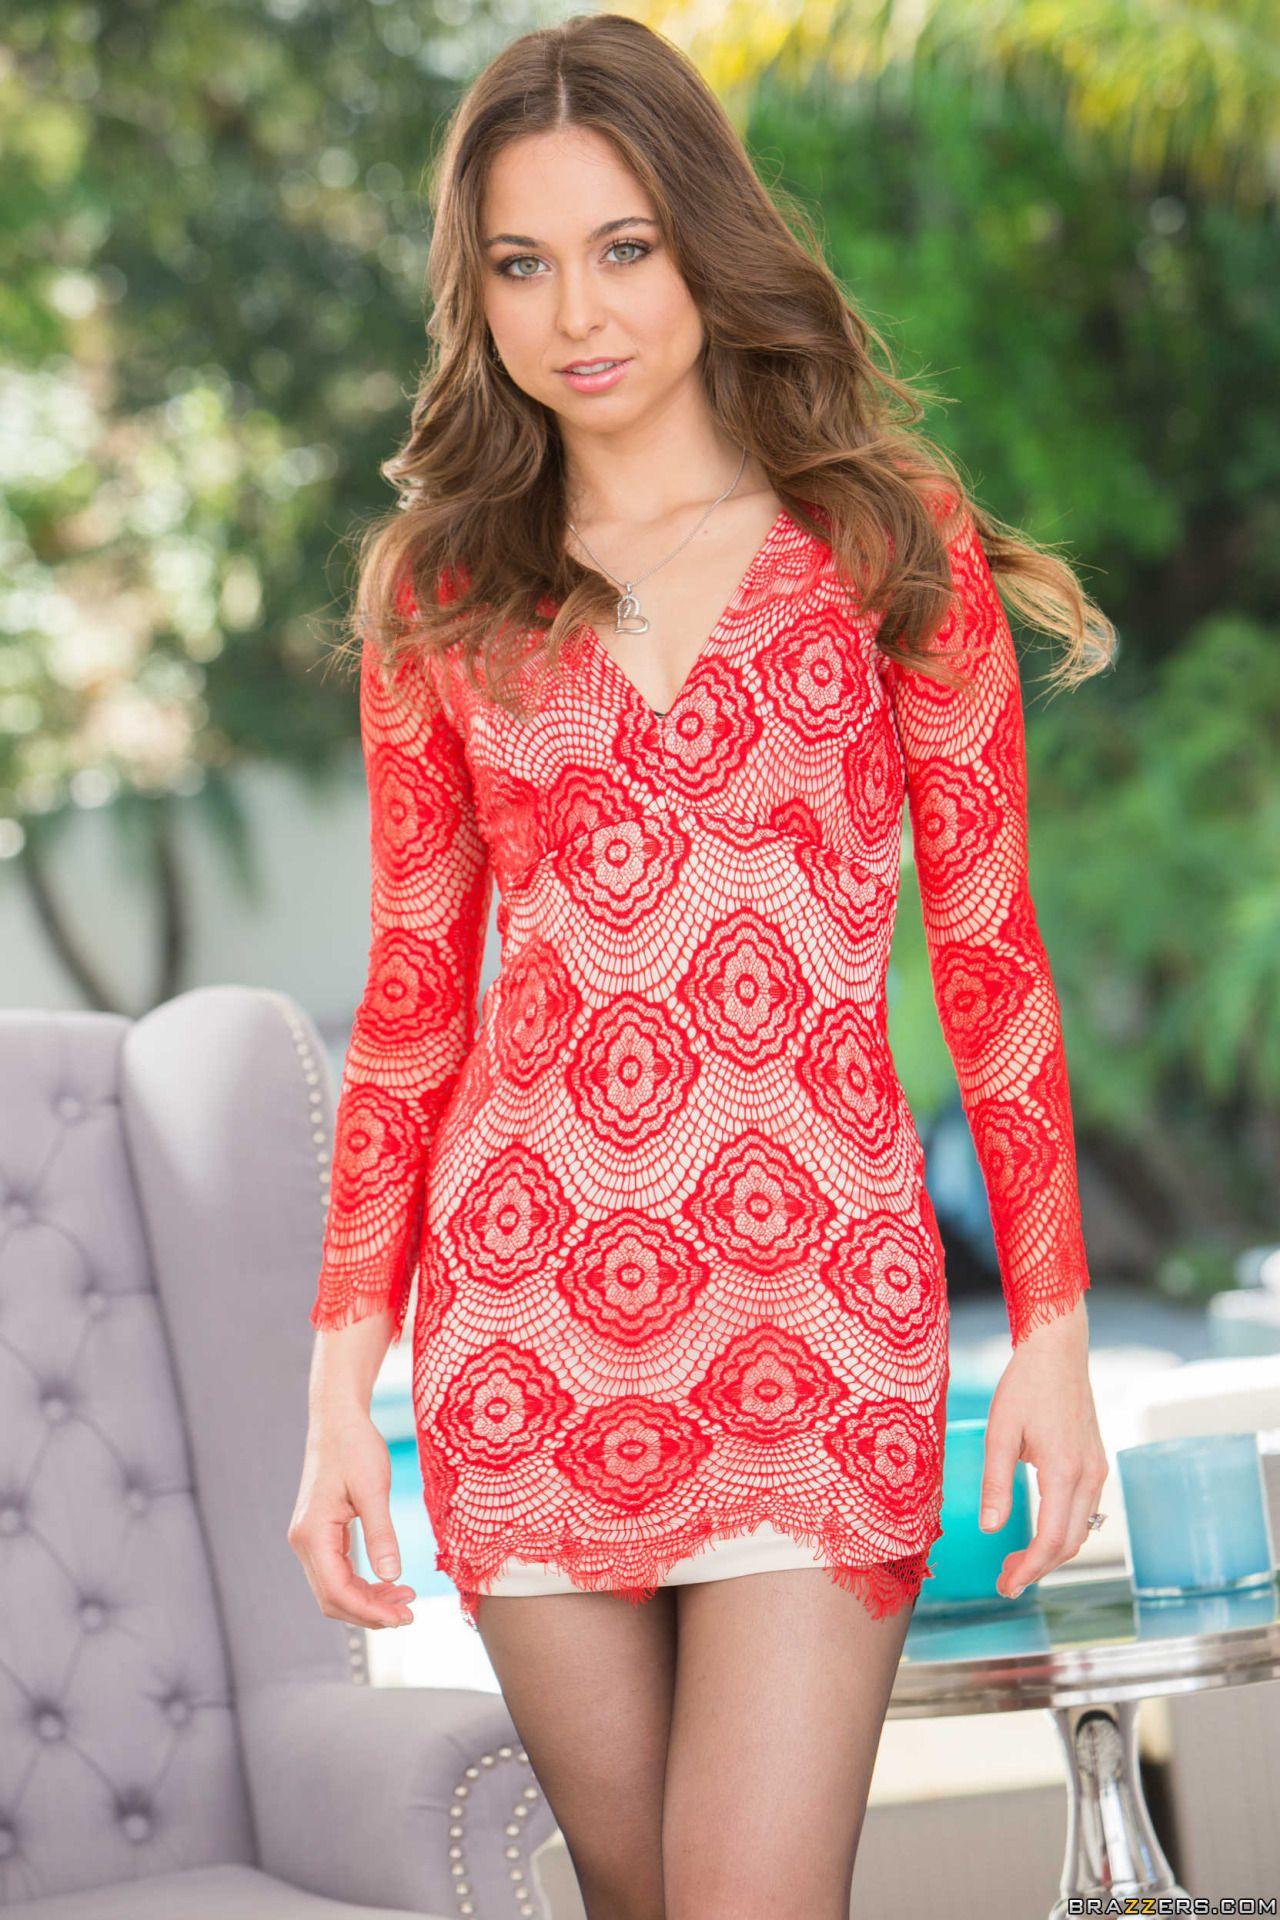 Riley Reid | Riley Reid | Pinterest | Stylish and Models